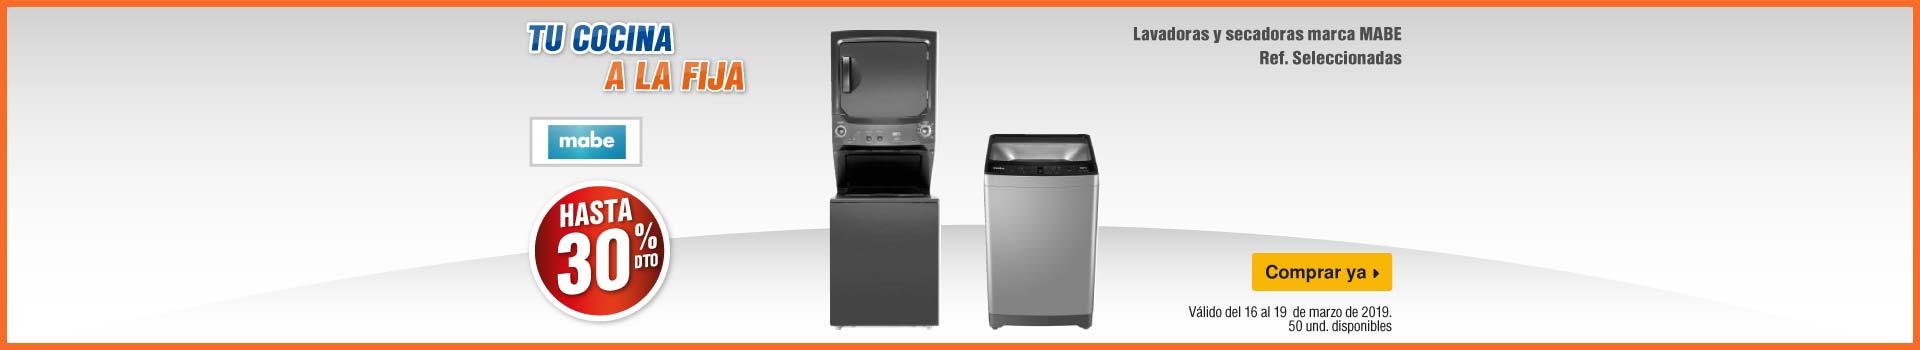 AK-KT-mayores-1-ELECT-BCAT-lavadoras-mabe-160319-2